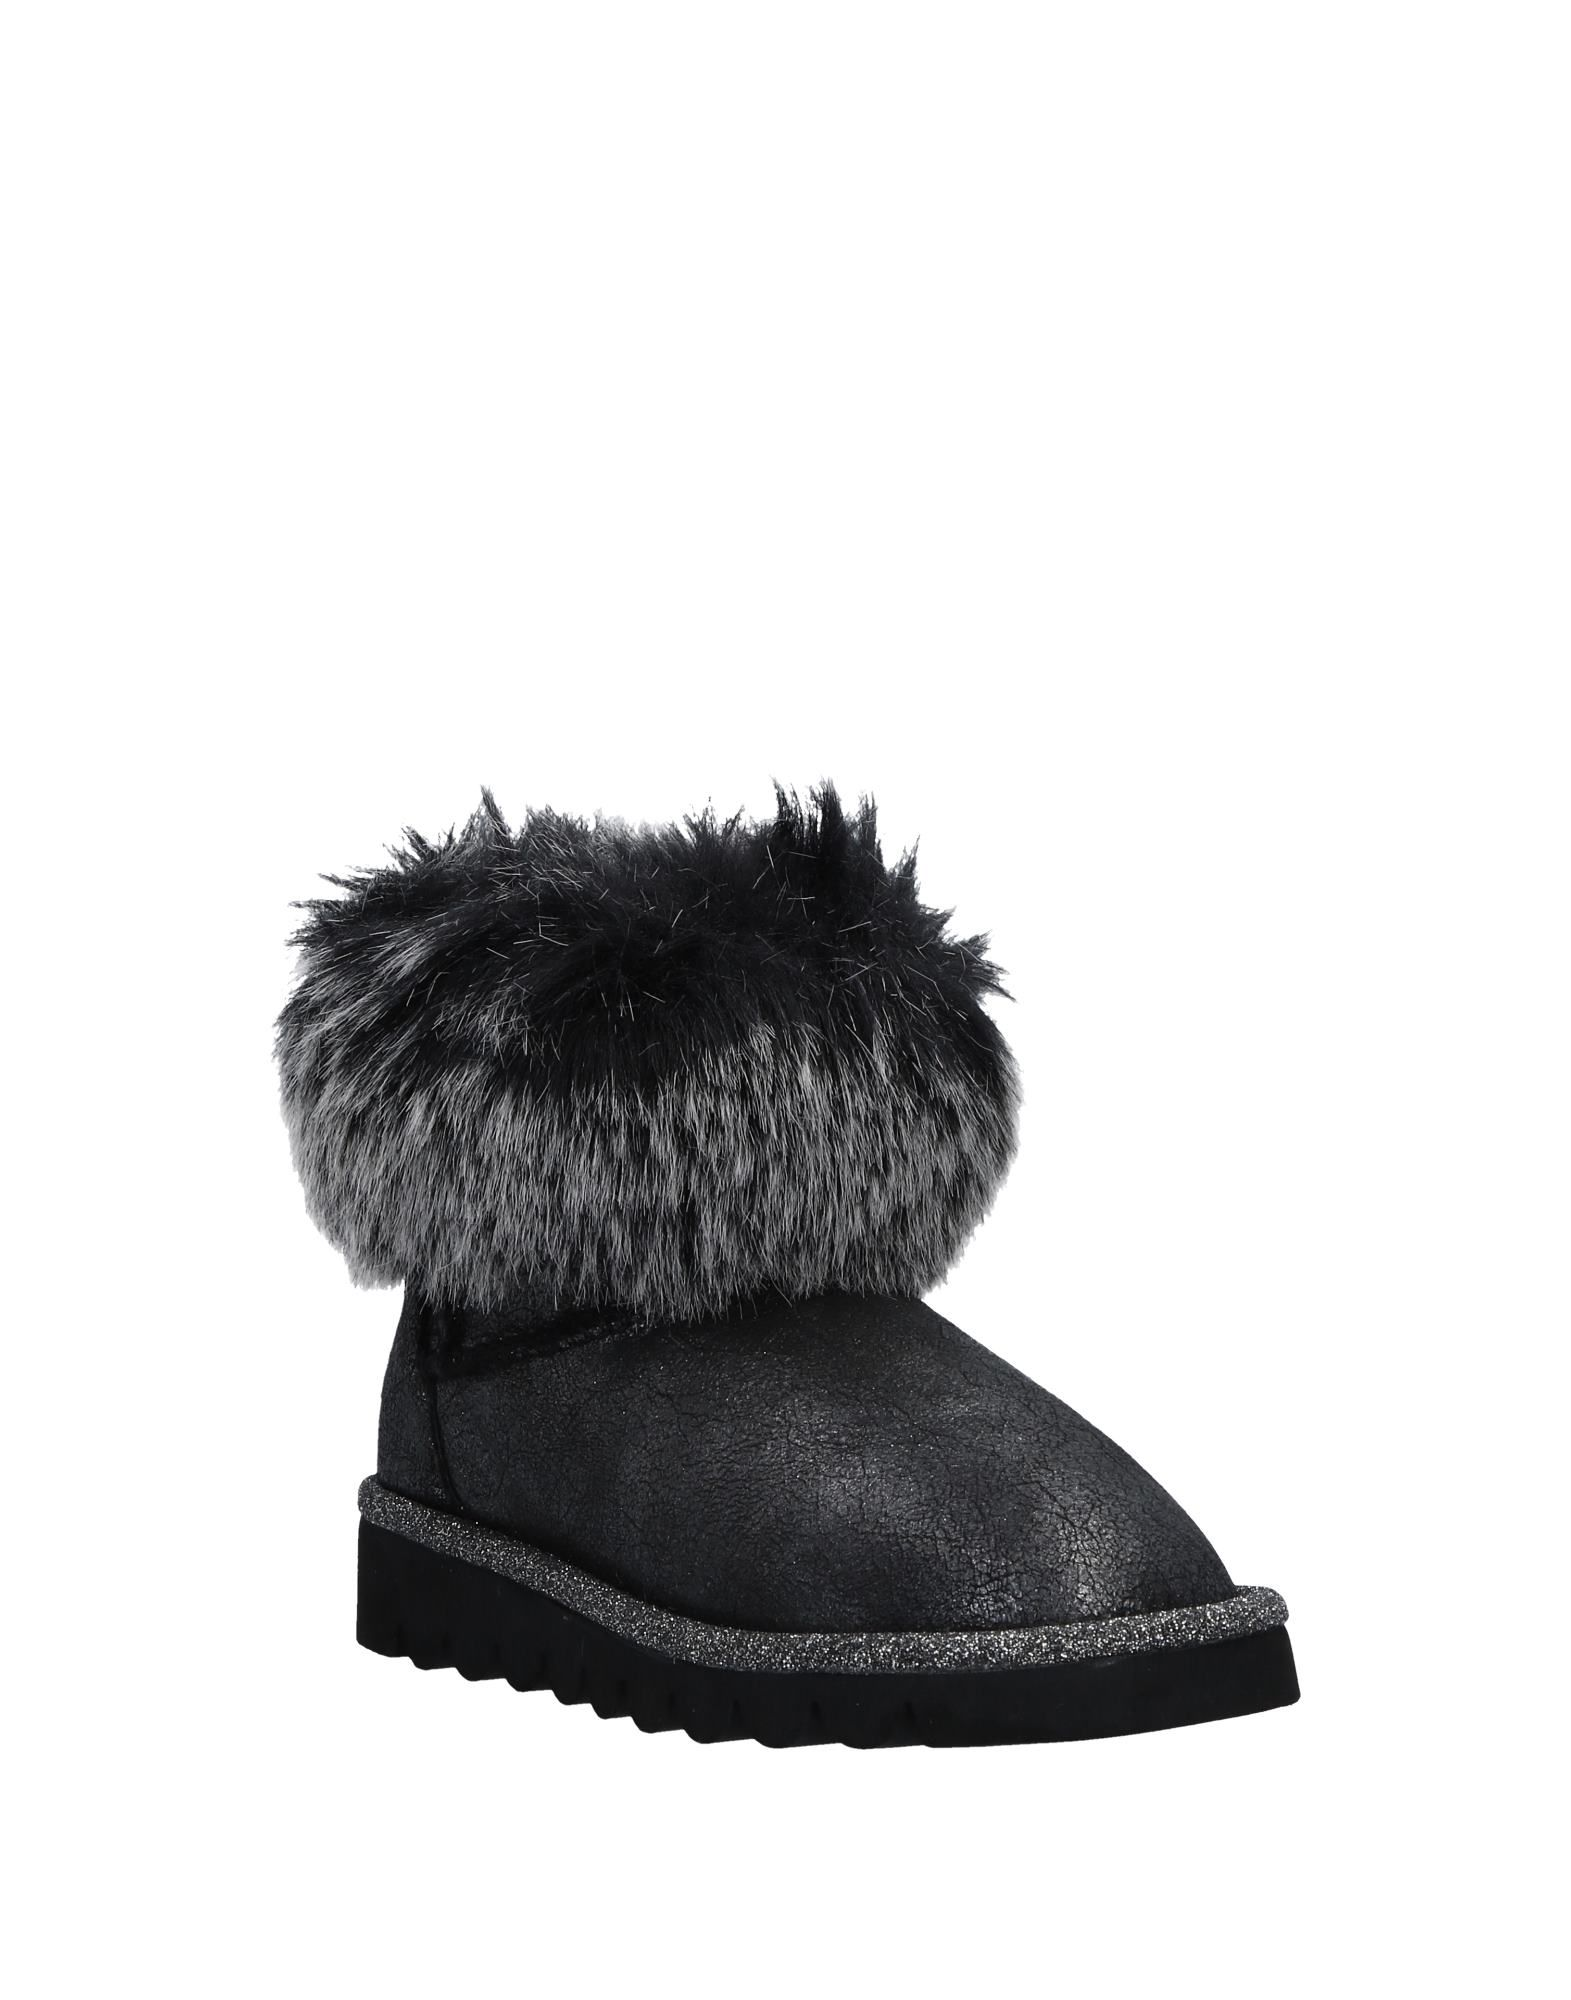 My Twin By Twin Set Stiefelette Damen  11539692OX 11539692OX 11539692OX Gute Qualität beliebte Schuhe c0d60d